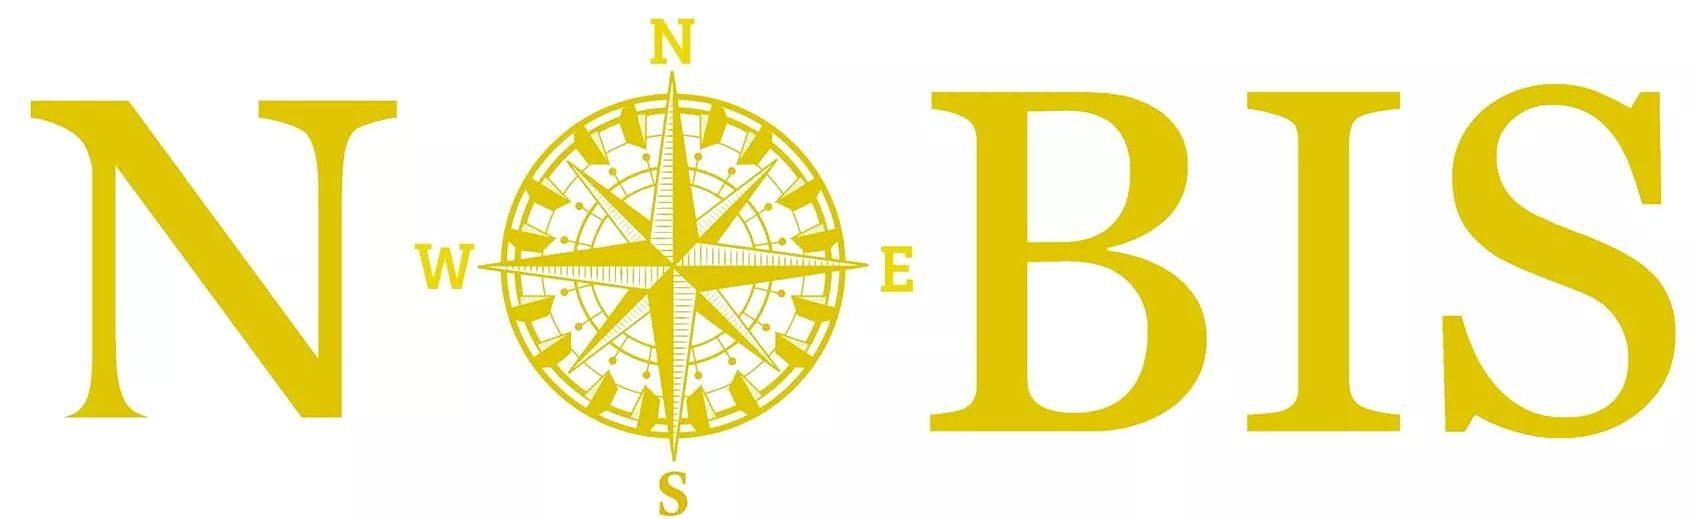 Turistička agencija Nobis | Arhiva Muzej krapinskog pračovjeka - Turistička agencija Nobis